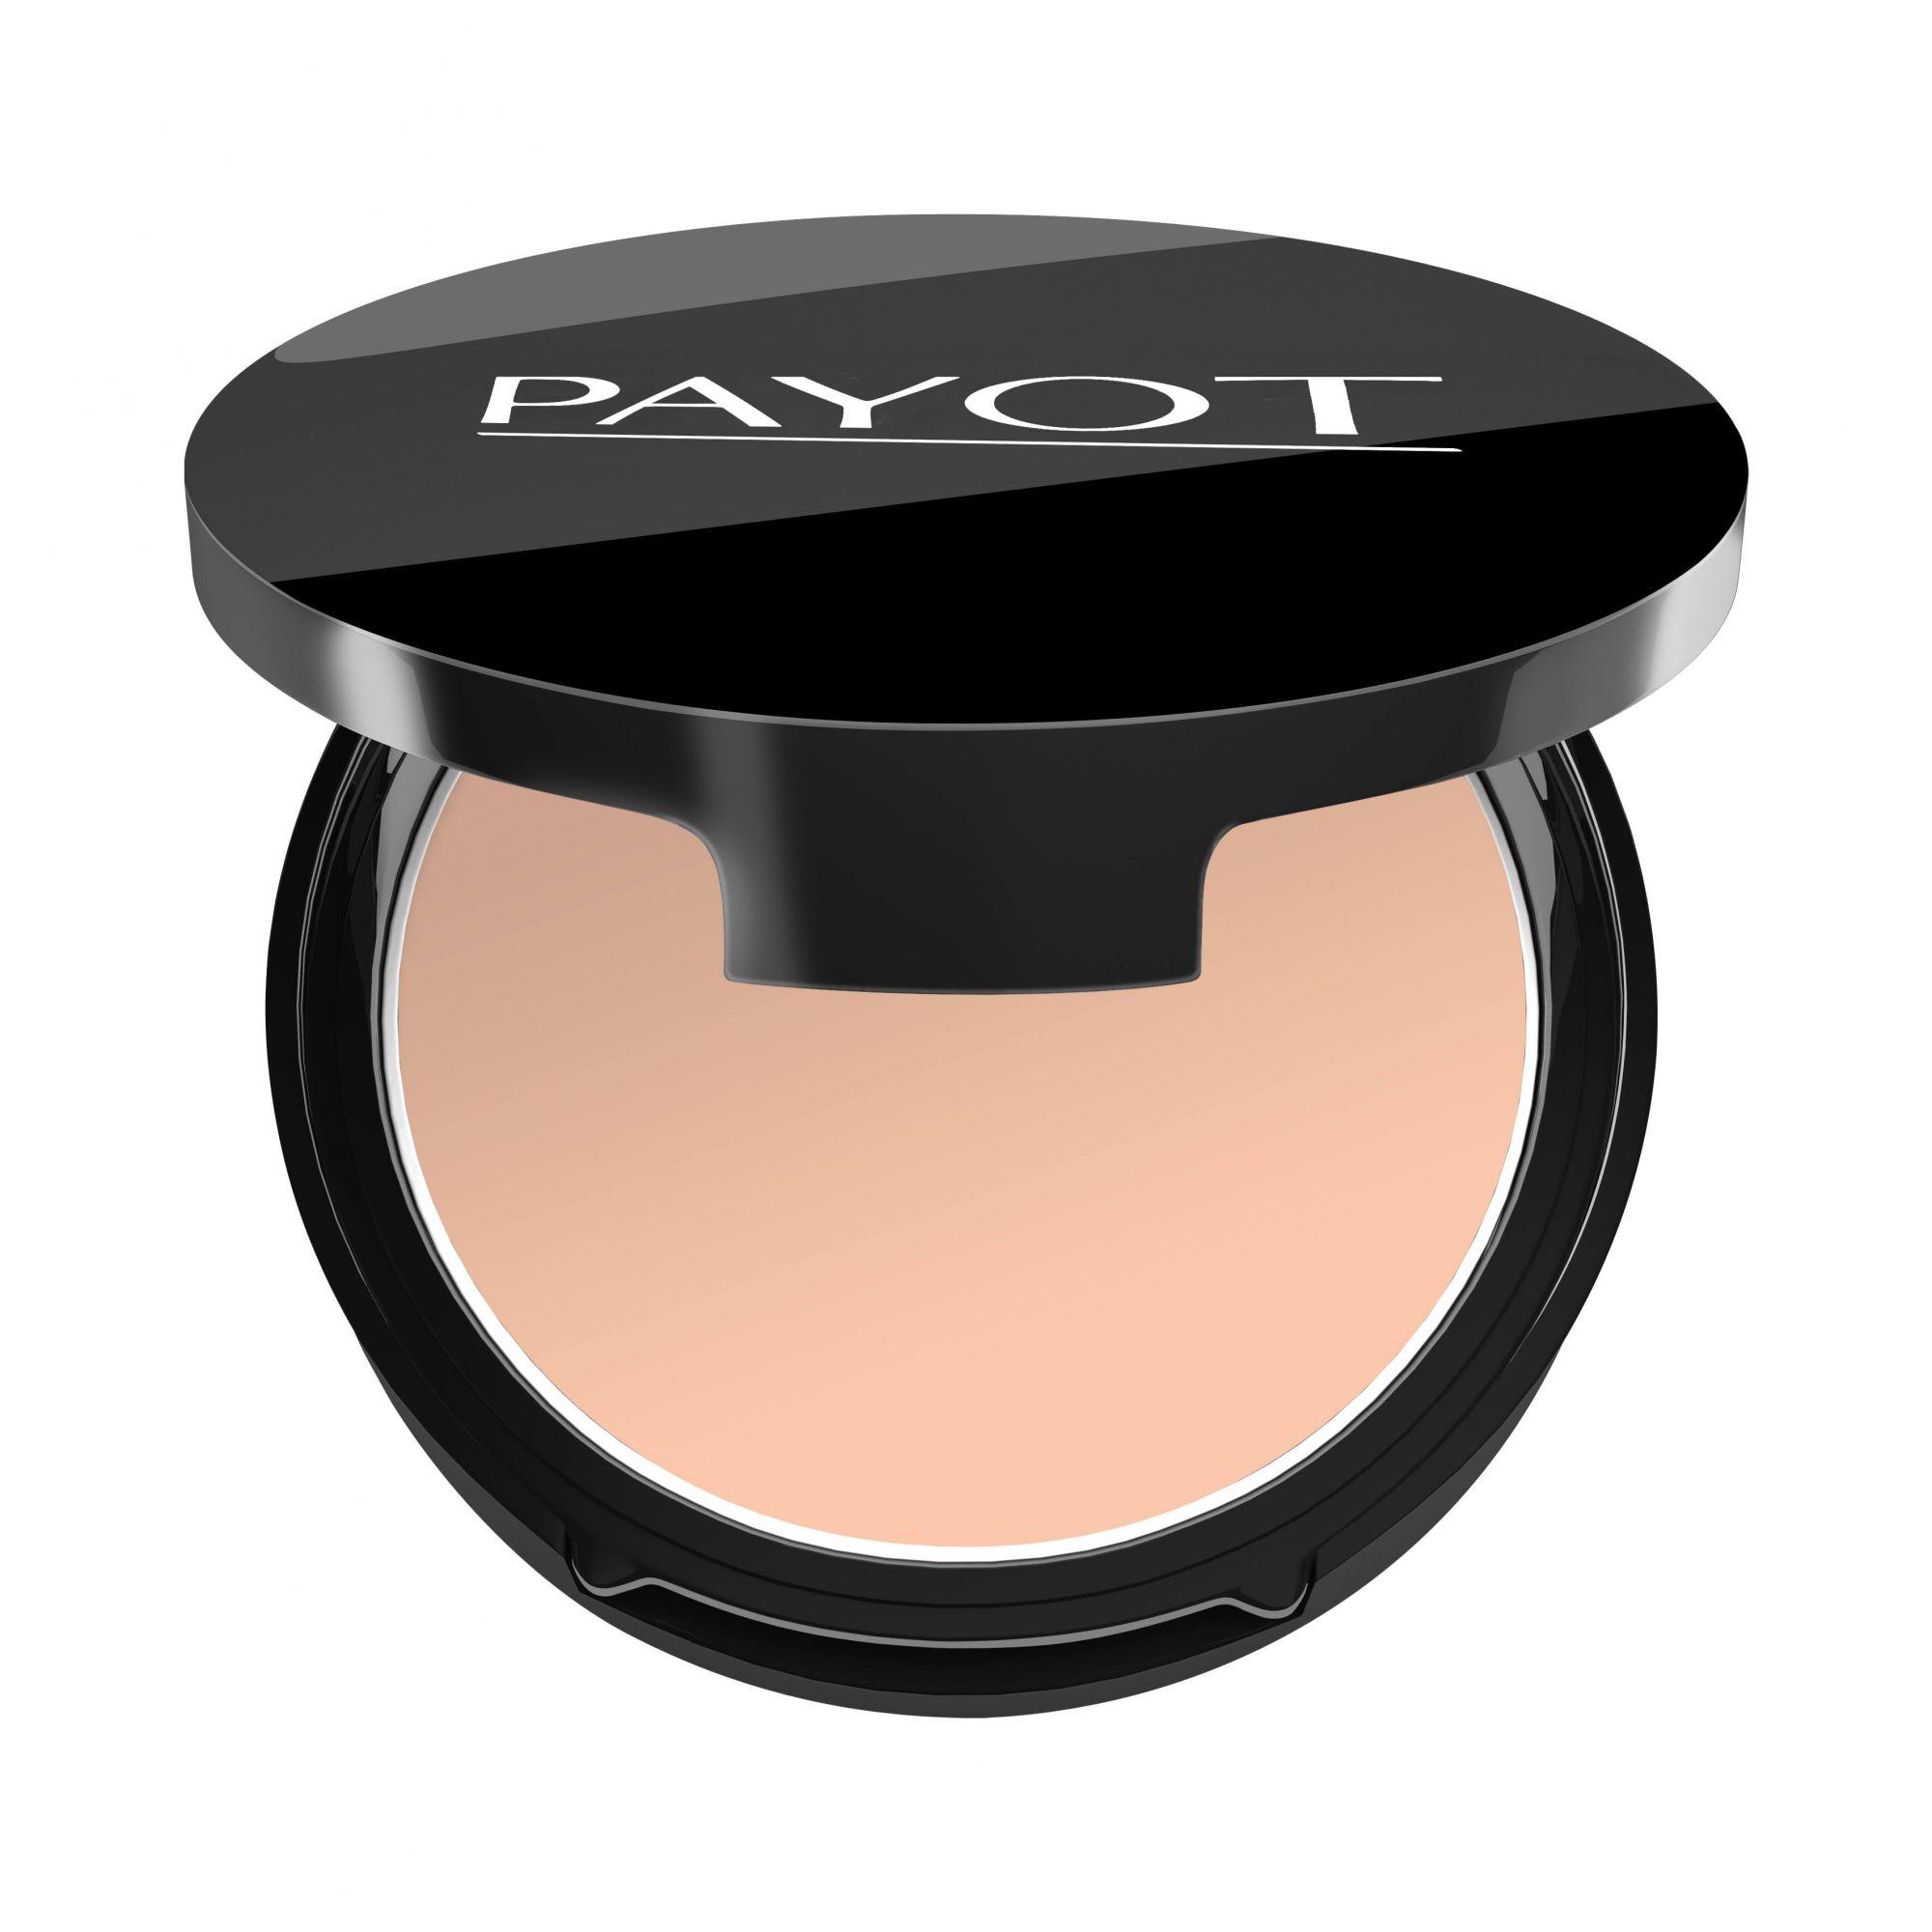 Pó Compacto HD Payot - 12g